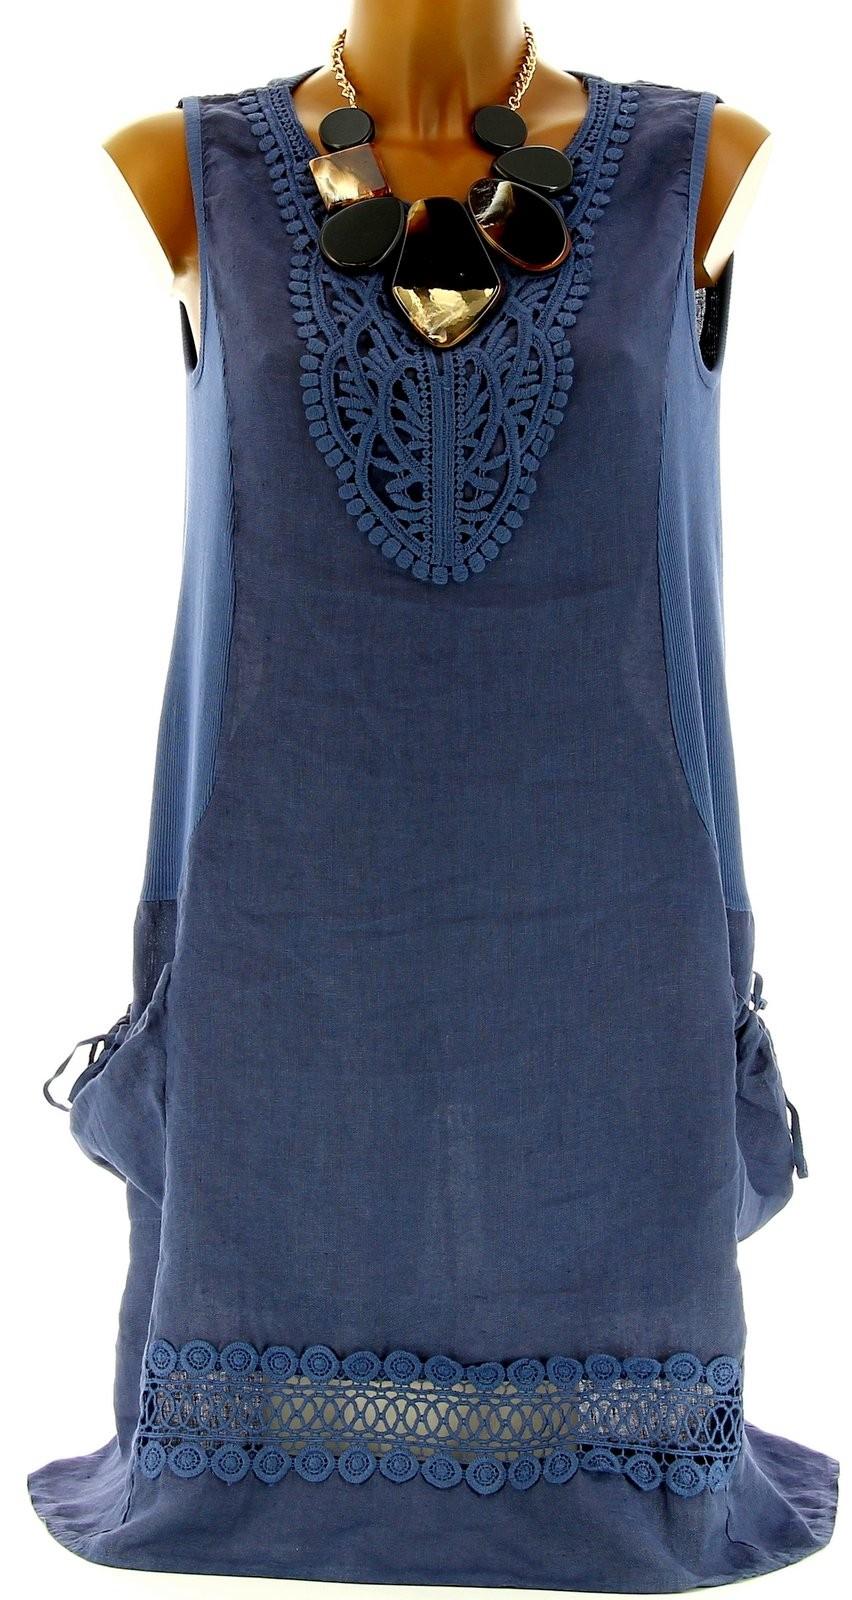 robe t lin dentelle macram boh me bleu jean cecilia bleu ebay. Black Bedroom Furniture Sets. Home Design Ideas